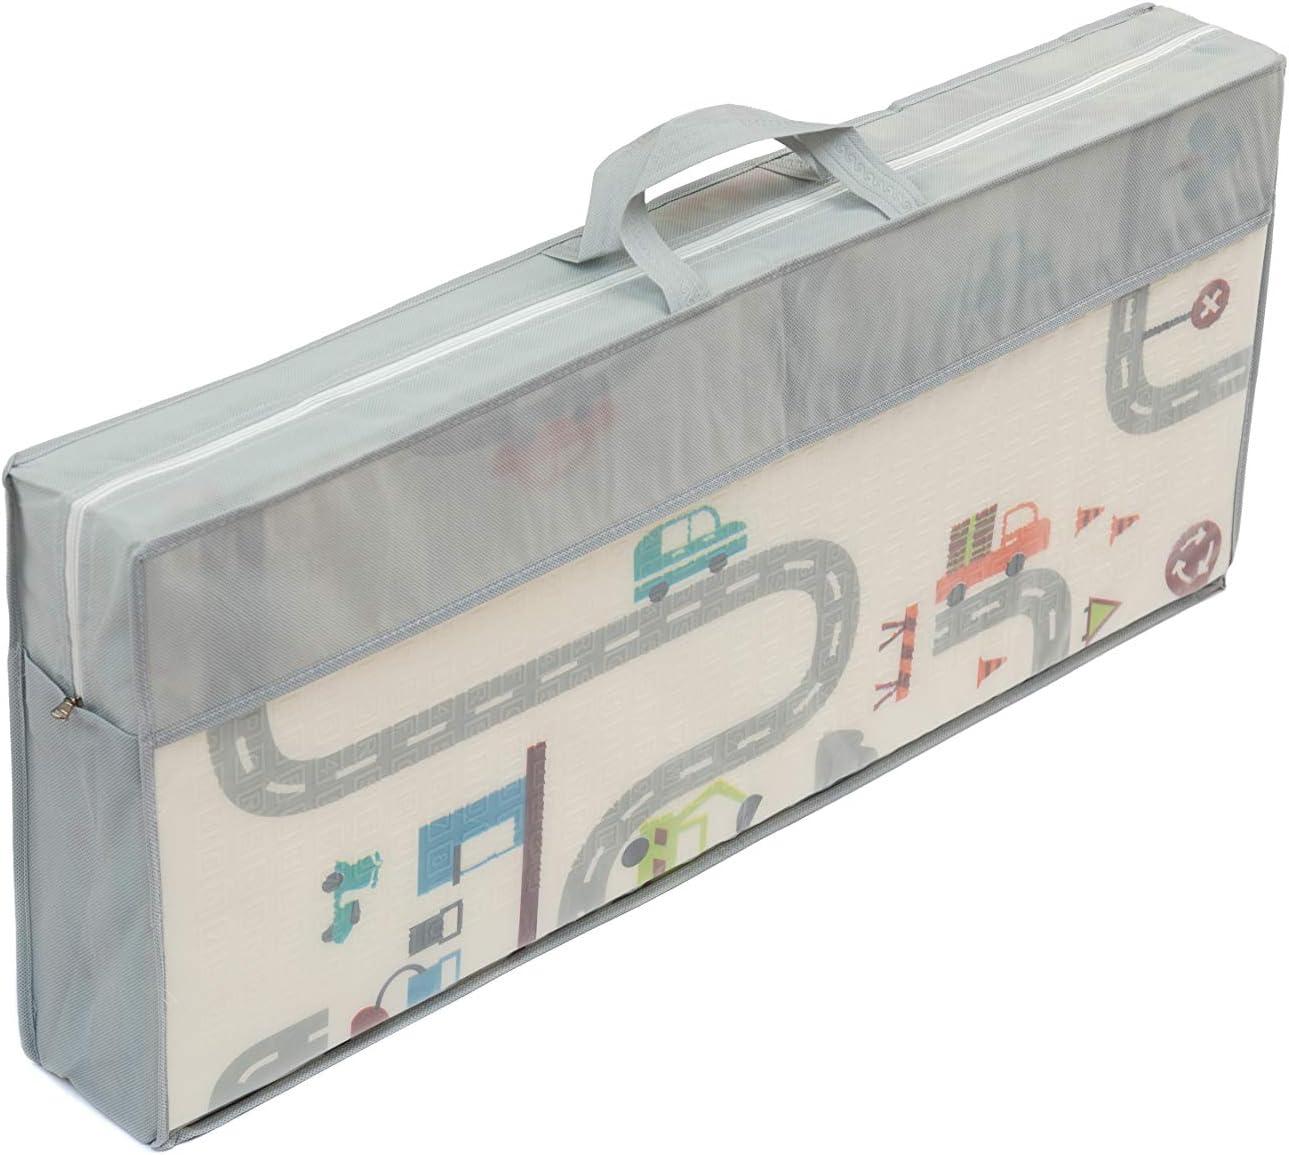 Modelo 3 Alfombra infantil plegable Suelo para bebes acolchado 2 caras 180 cm x 160 cm